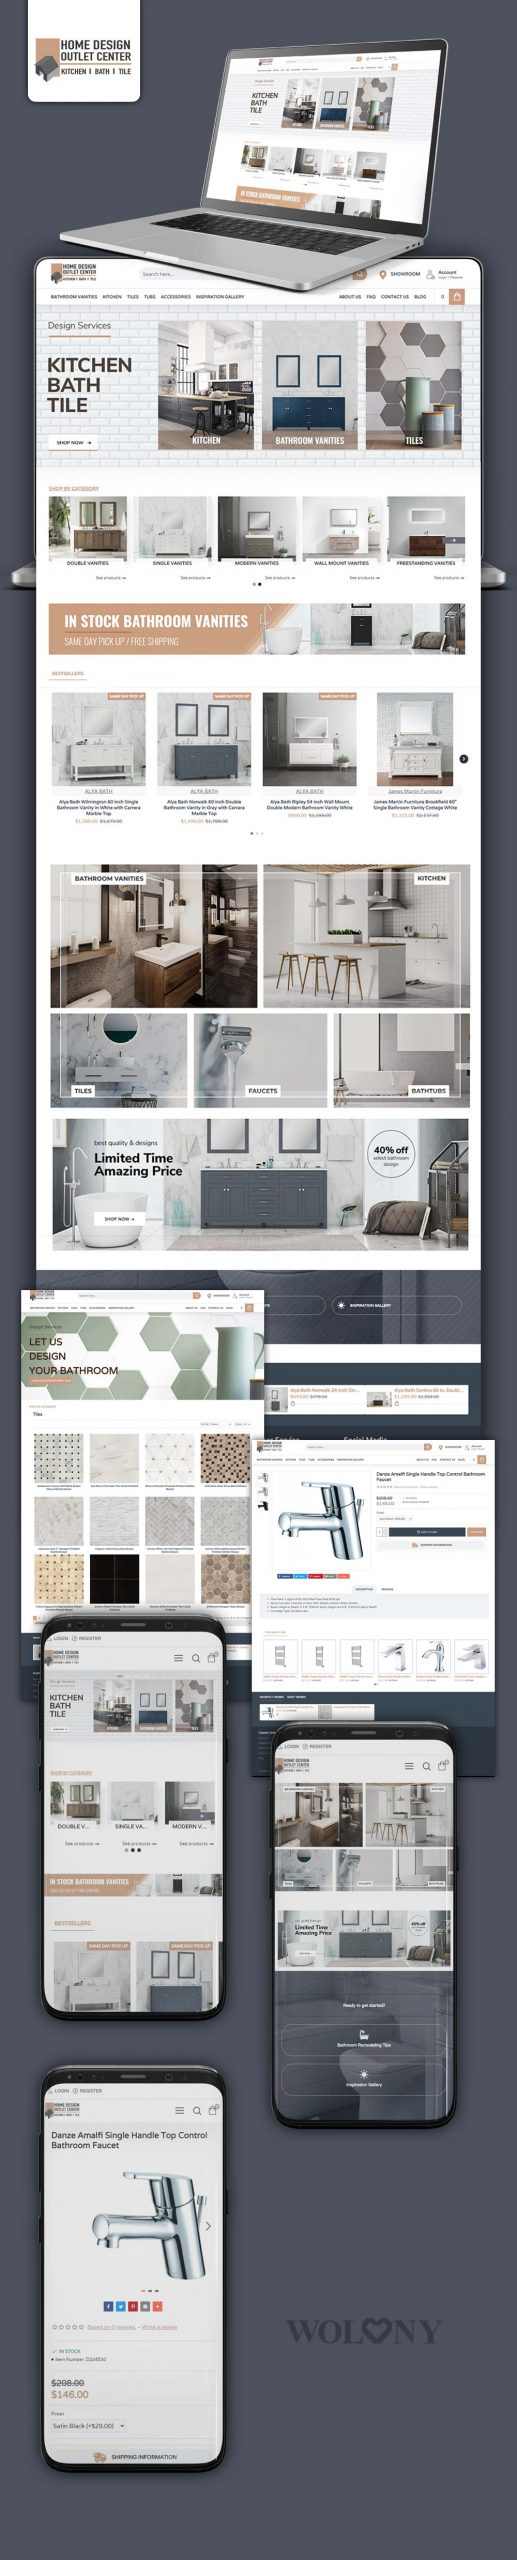 mockup-homedesign